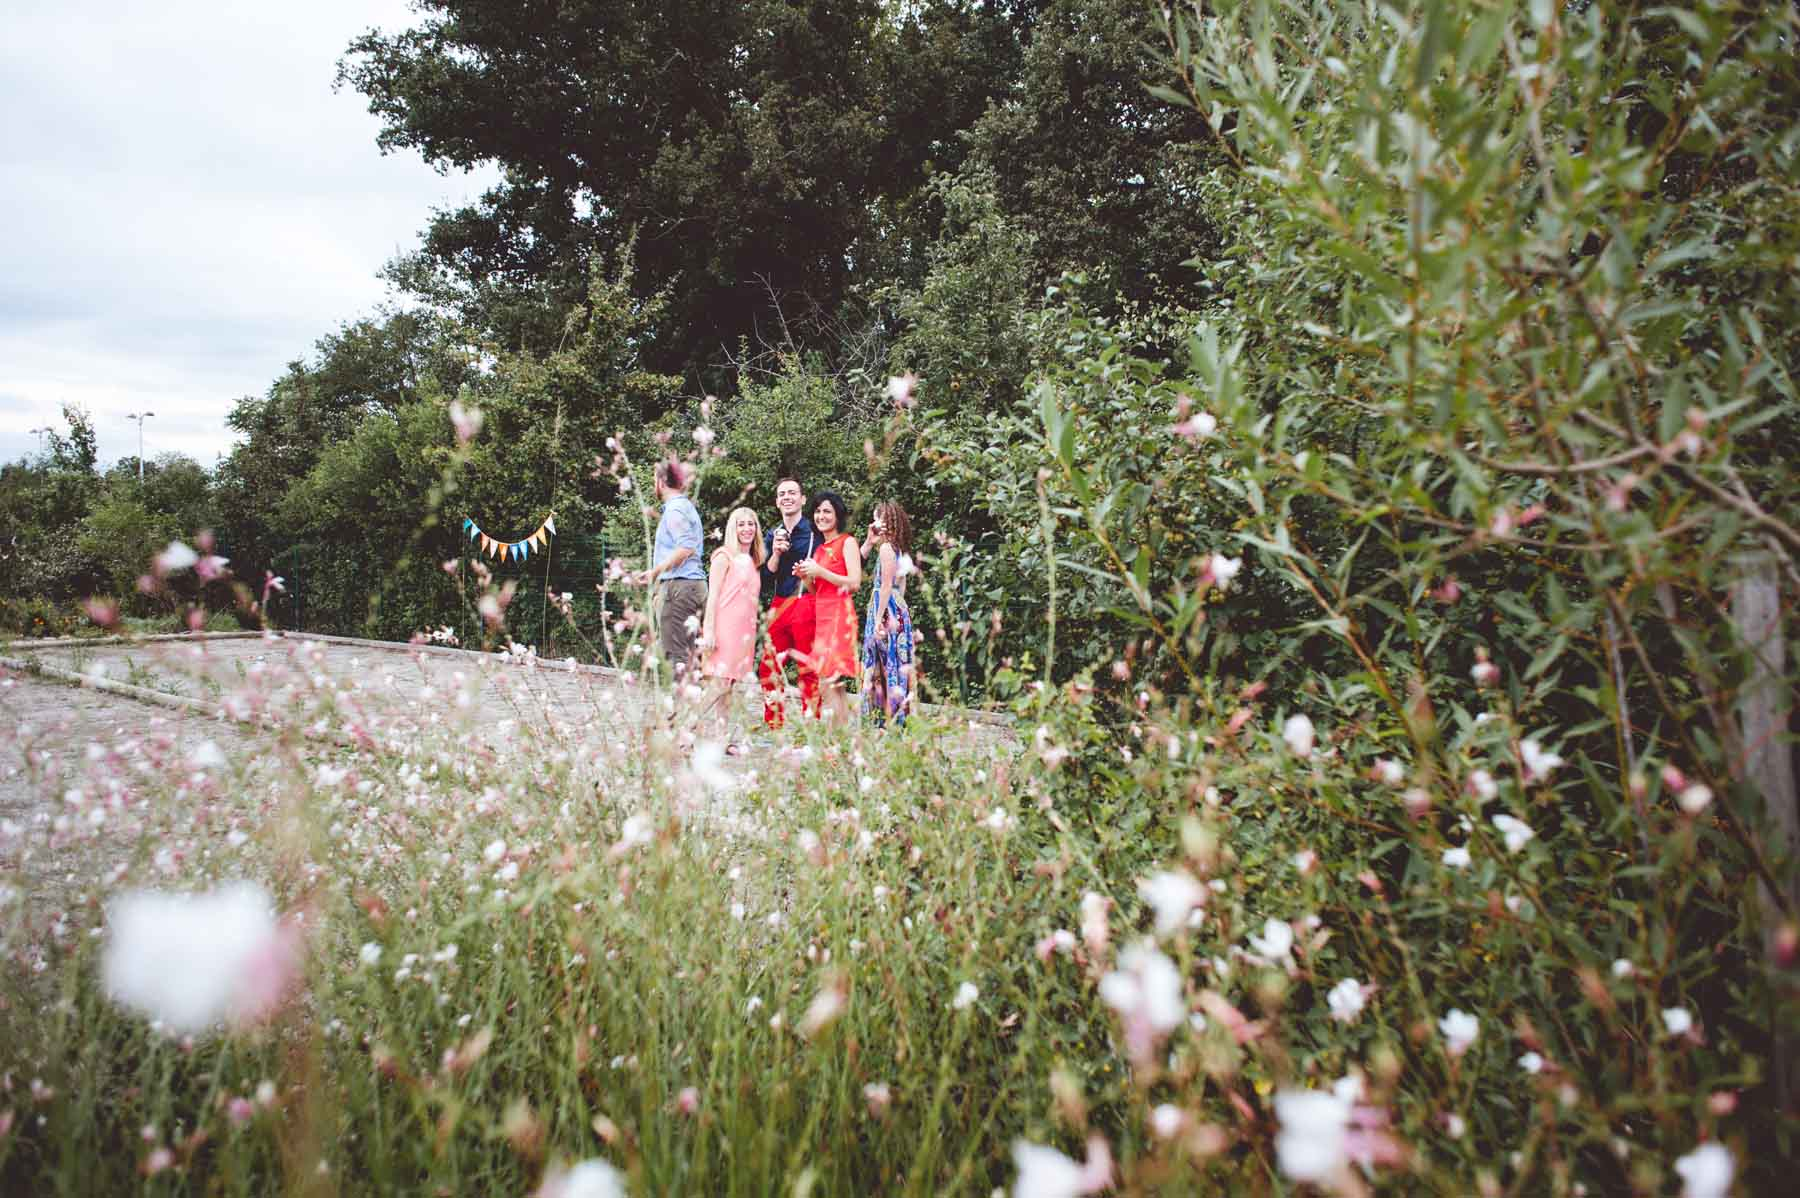 Photographe mariage original toulouse montpellier - M et S - Mademoiselle G Photographie (48)